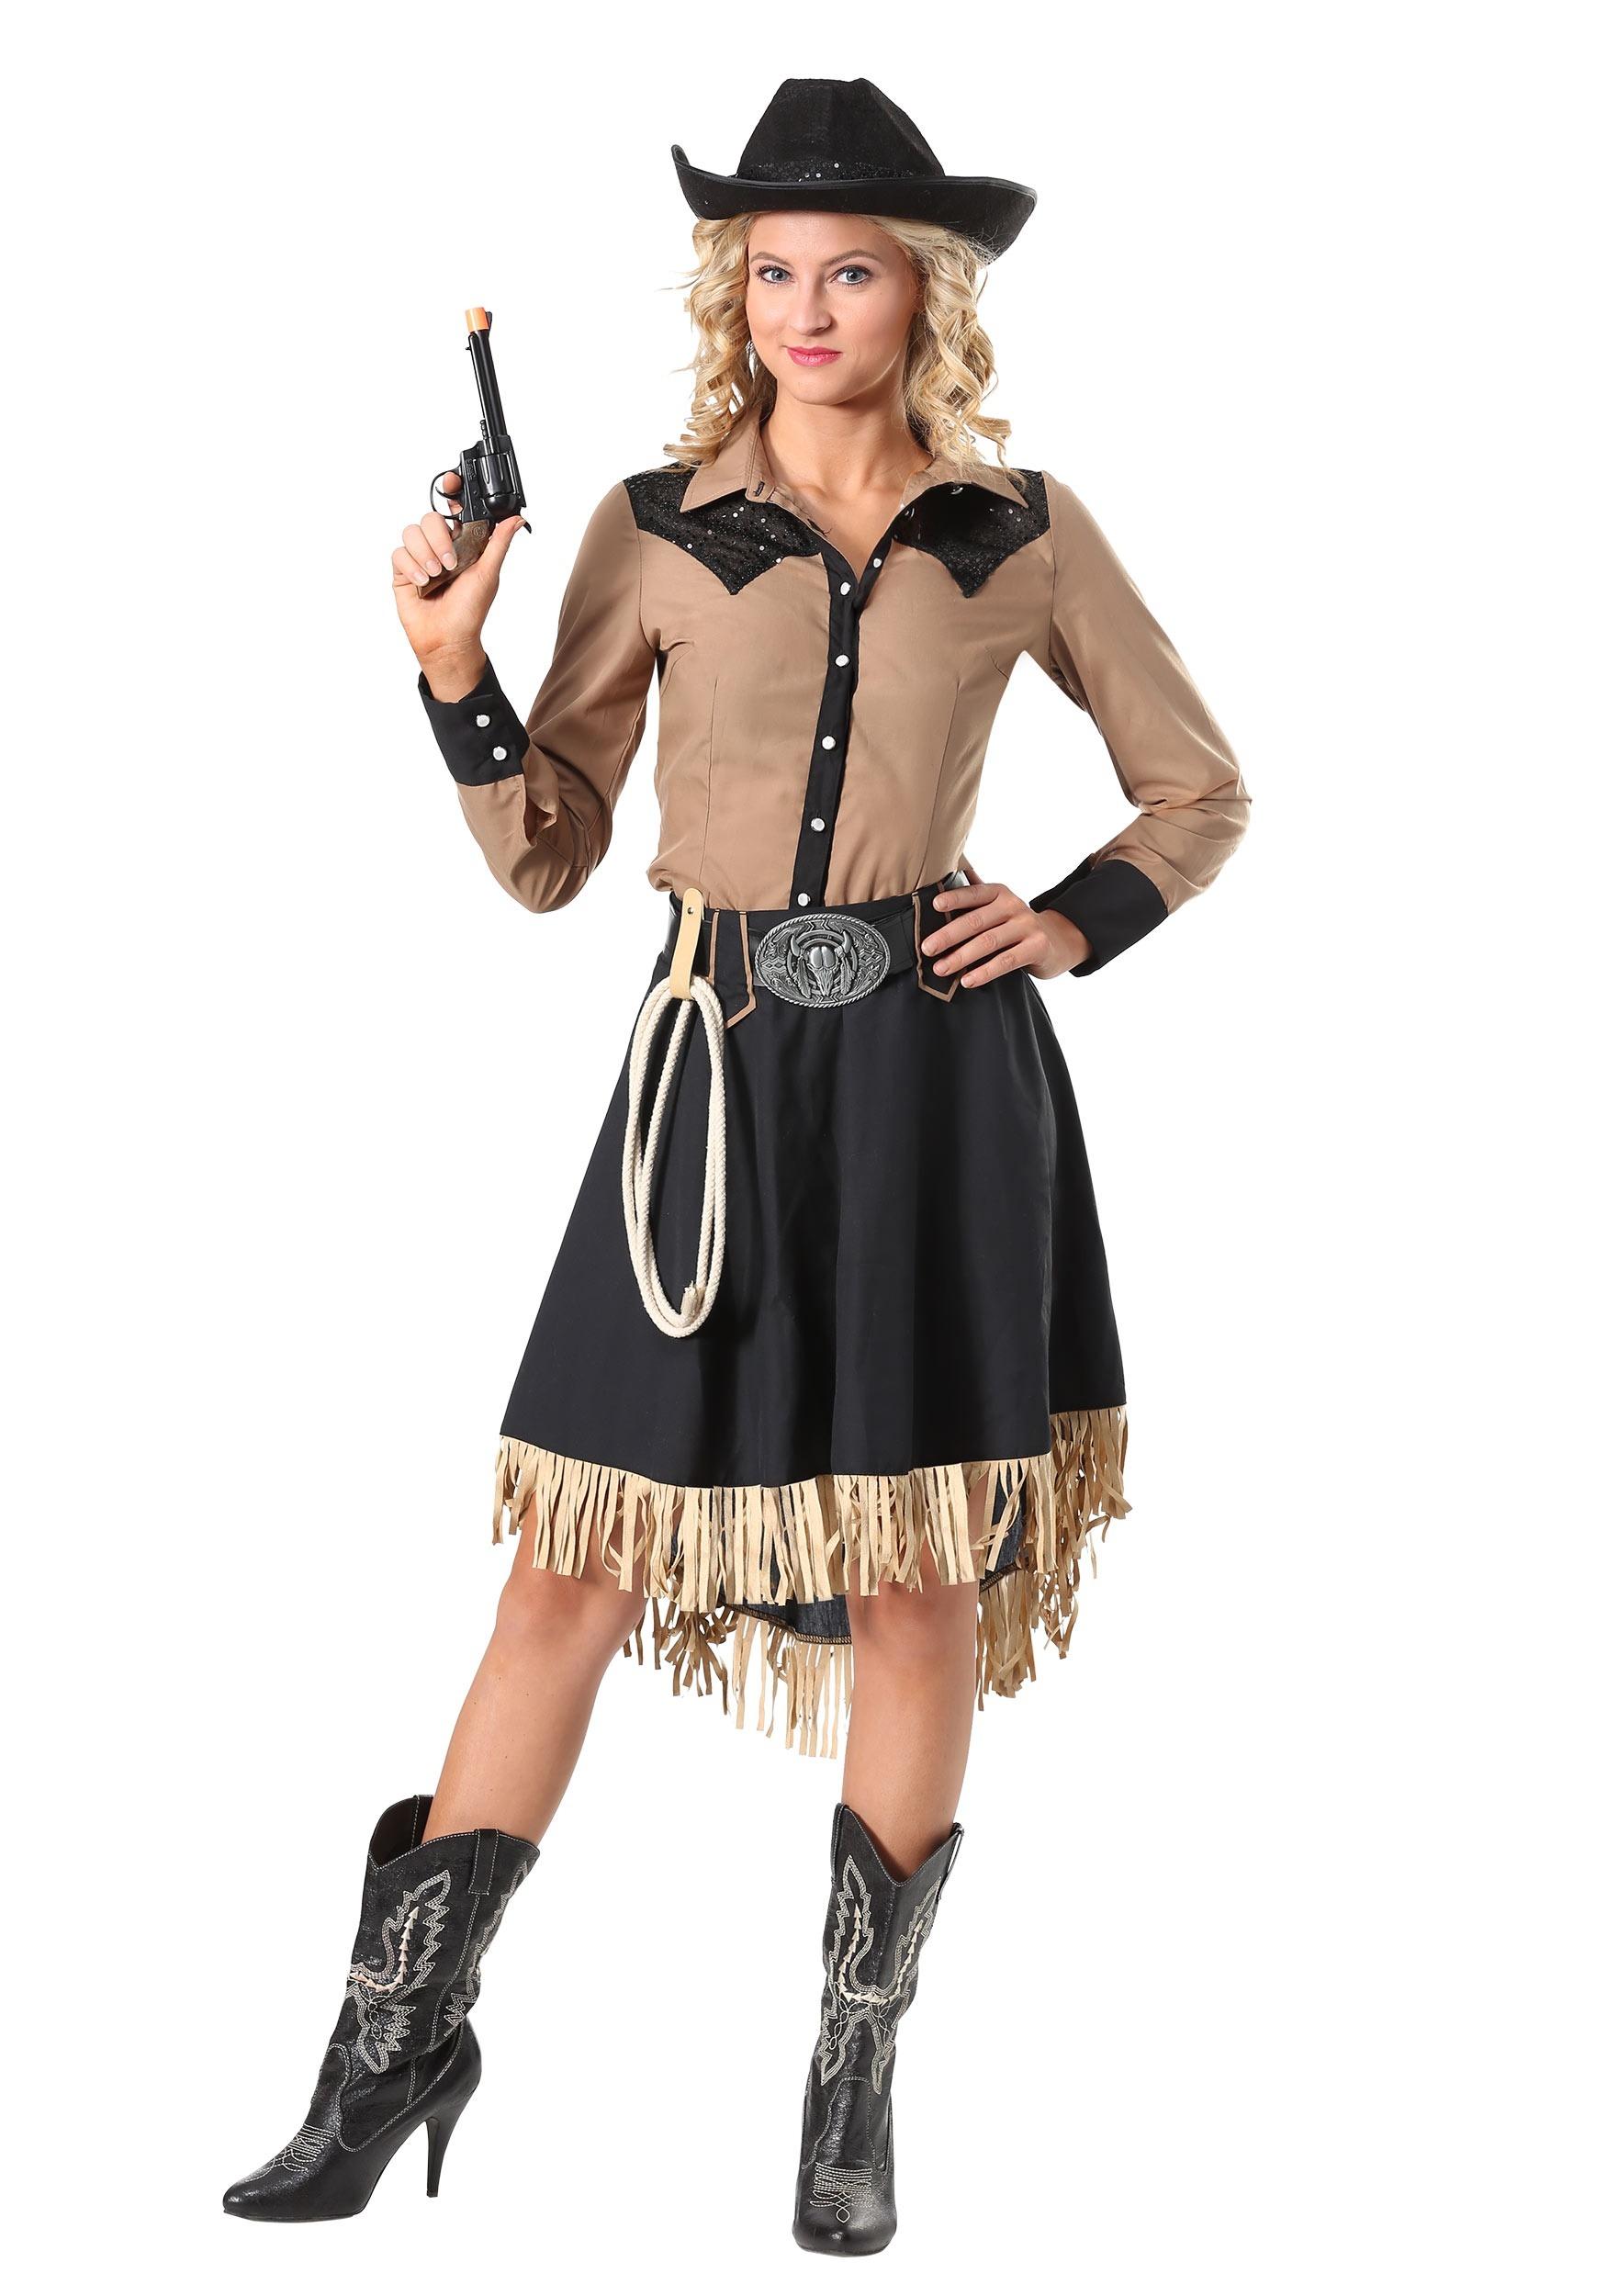 Lasson Cowgirl Plus Size Costume For Women